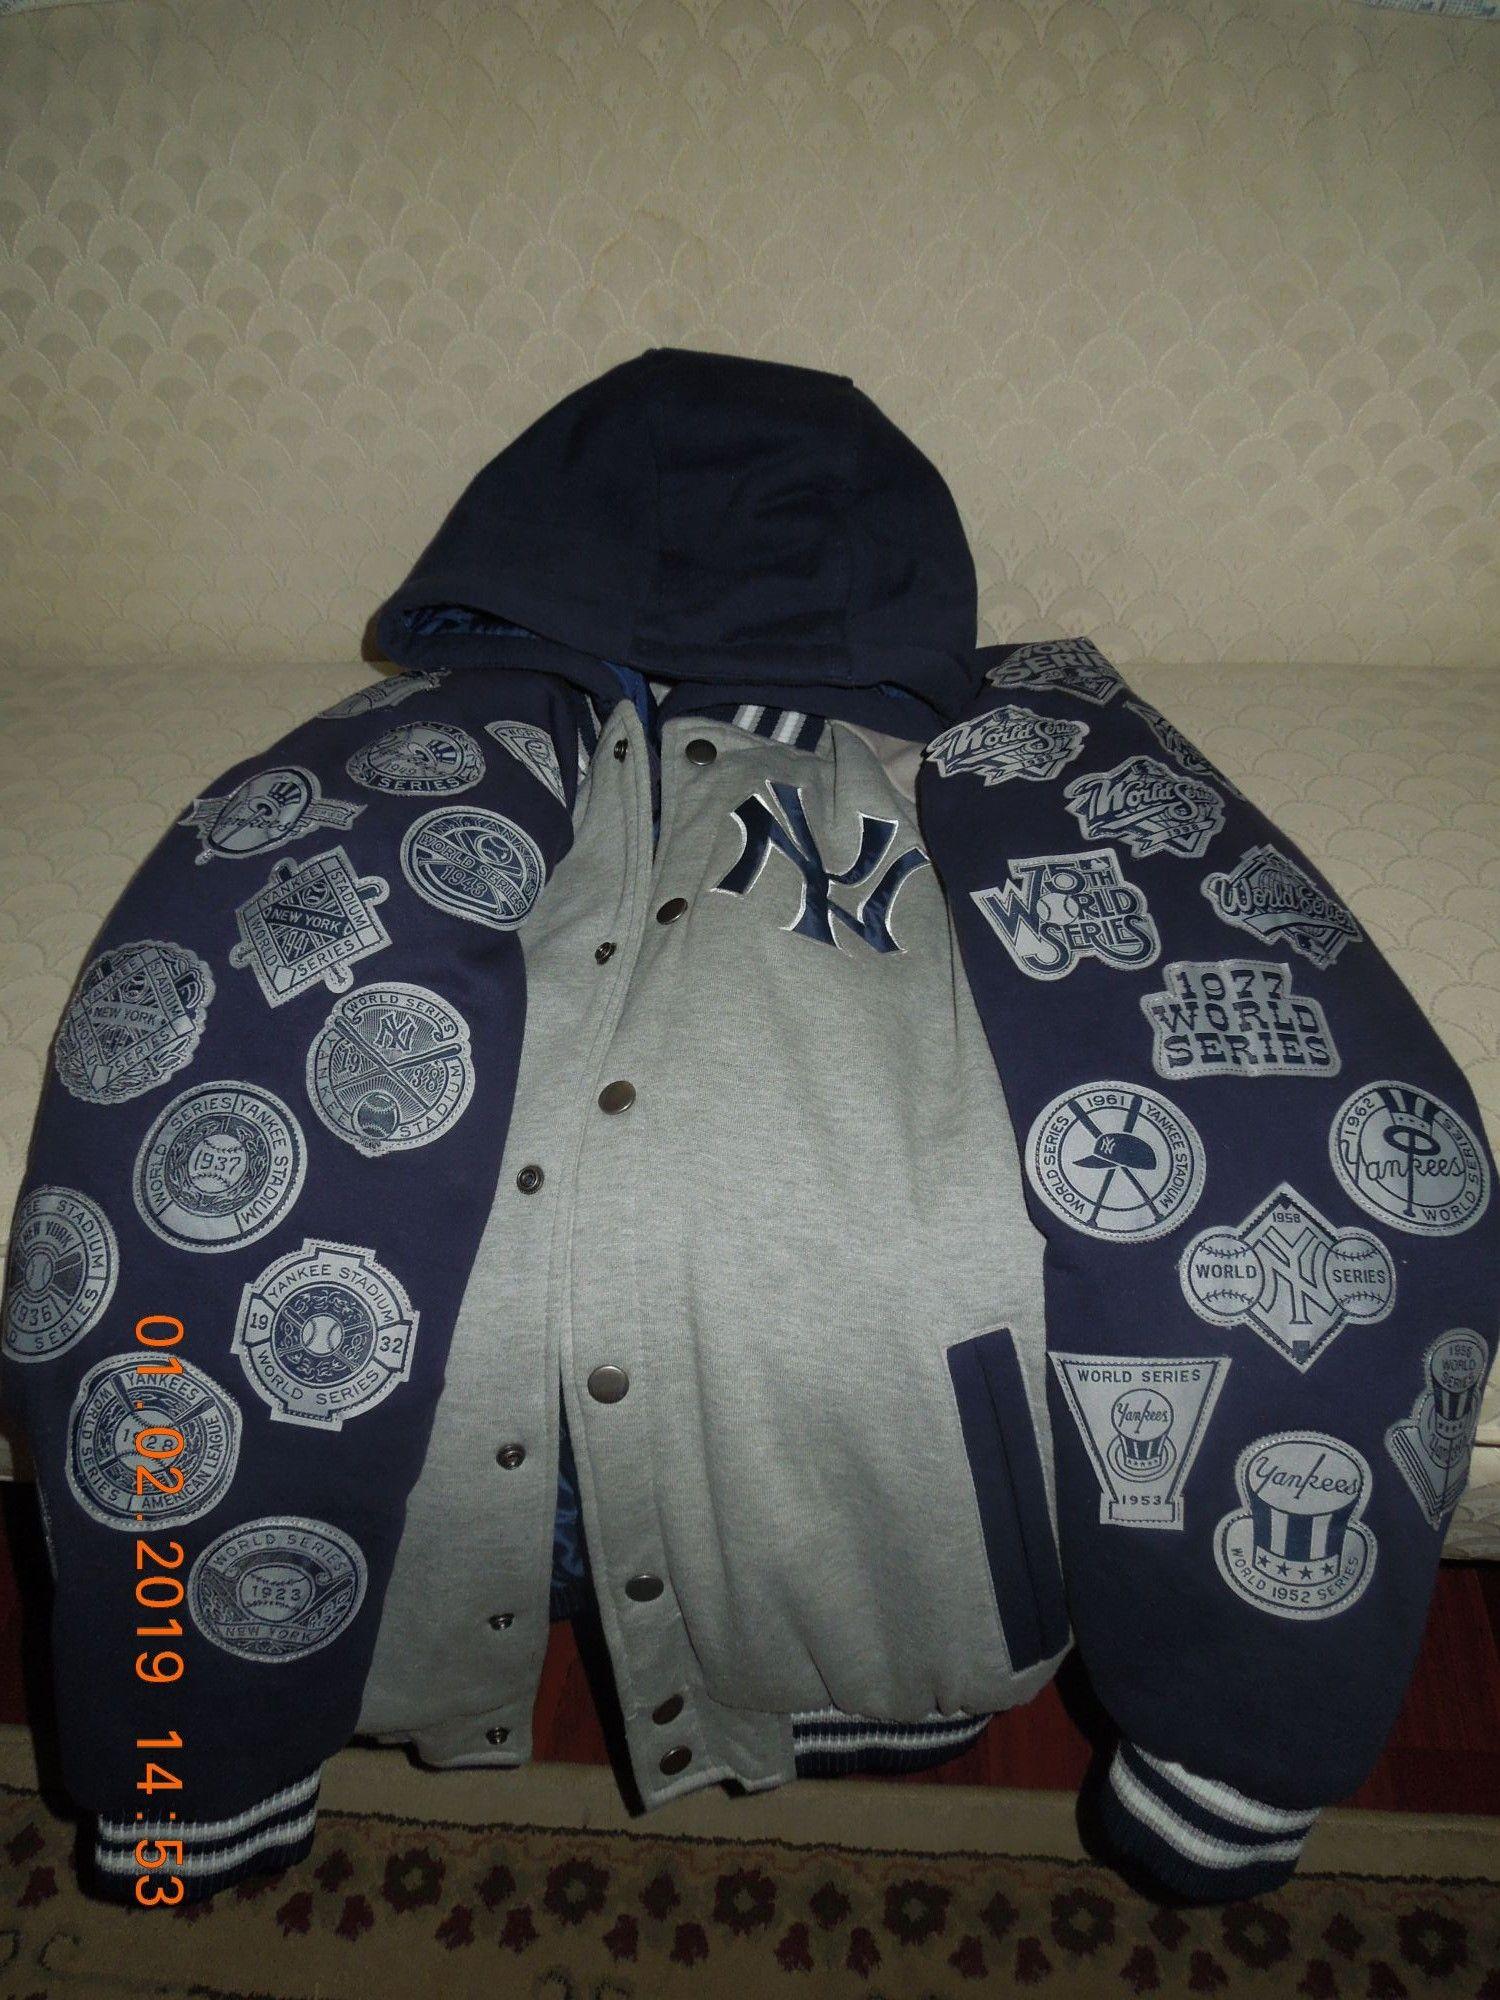 New York Yankee World Series Champion Jacket For Sale